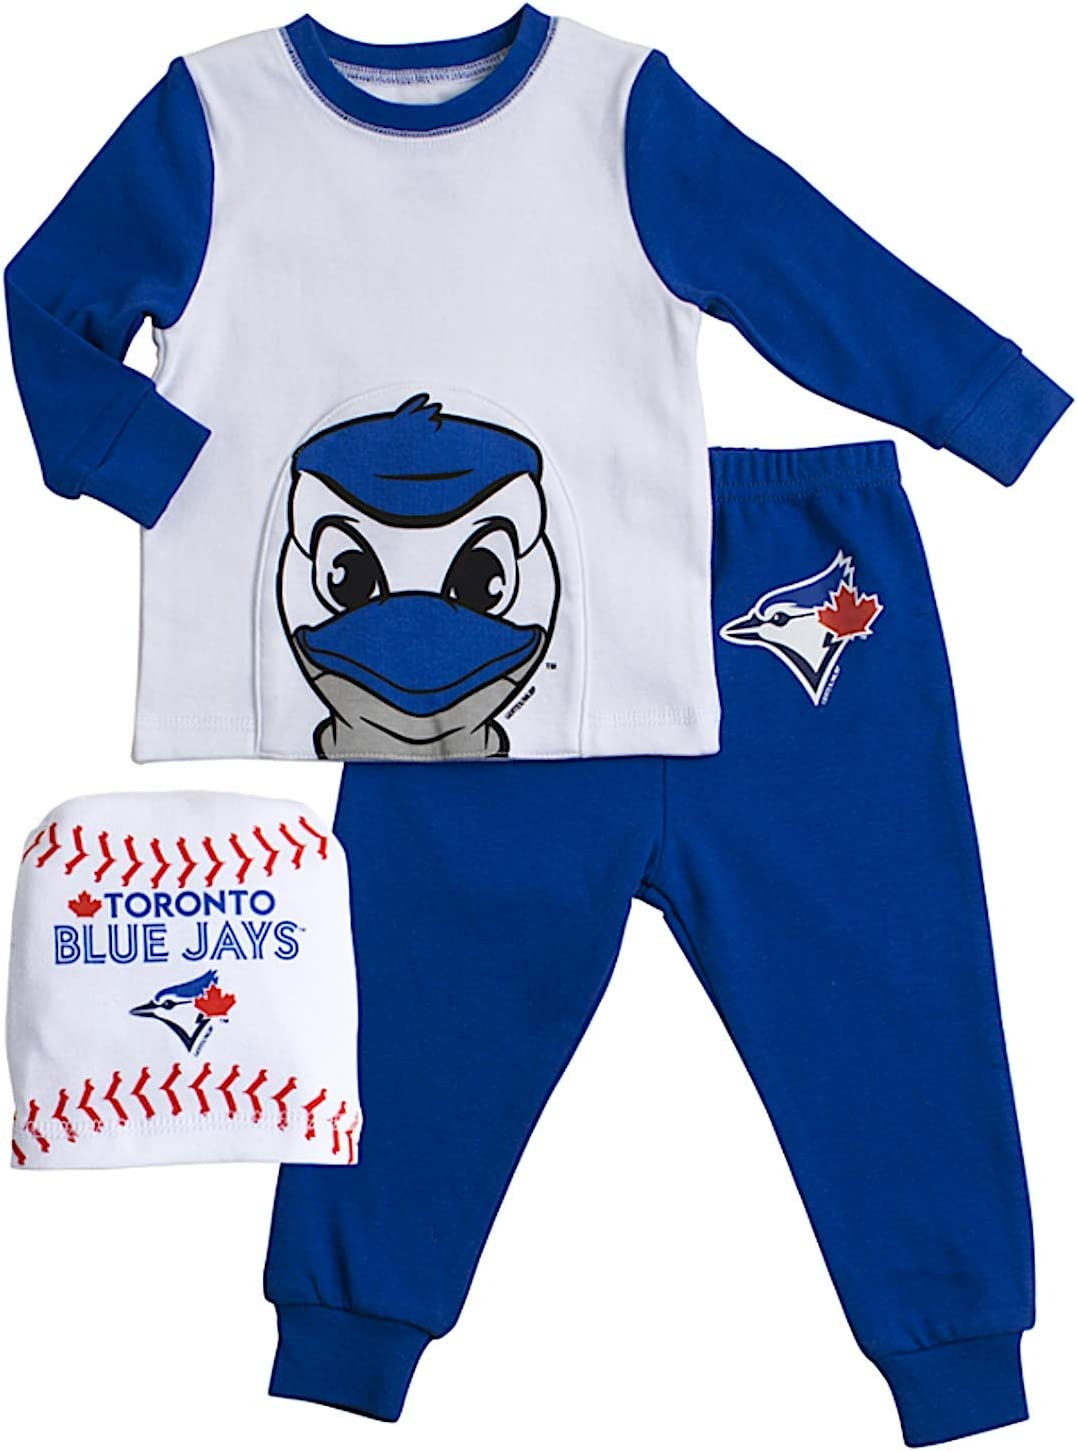 MLB Toronto Blue Jays Toddler Covert A Toy 2 Piece Pant Set 12 Months